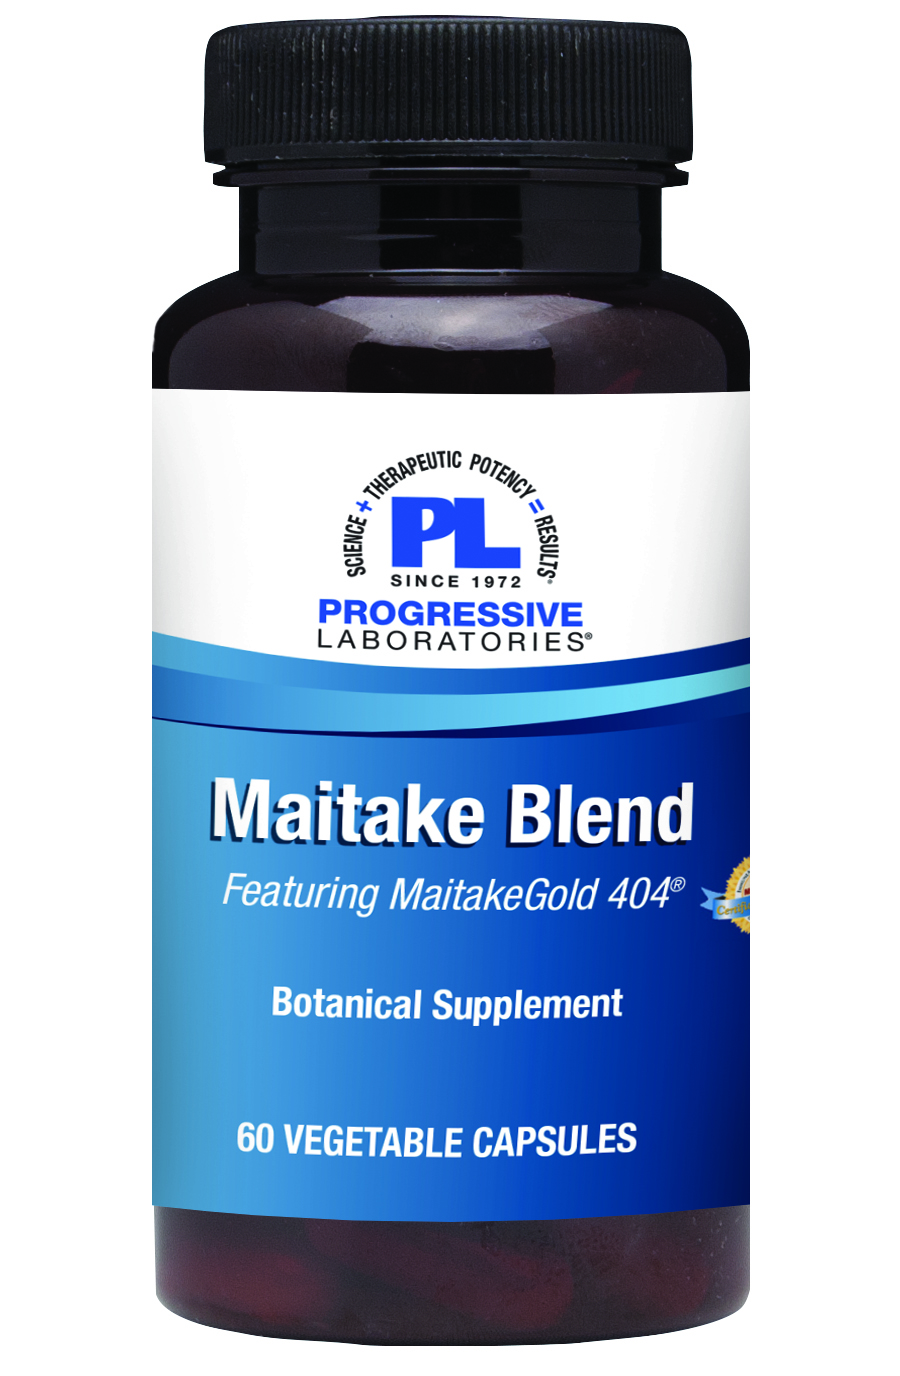 Maitake Blend